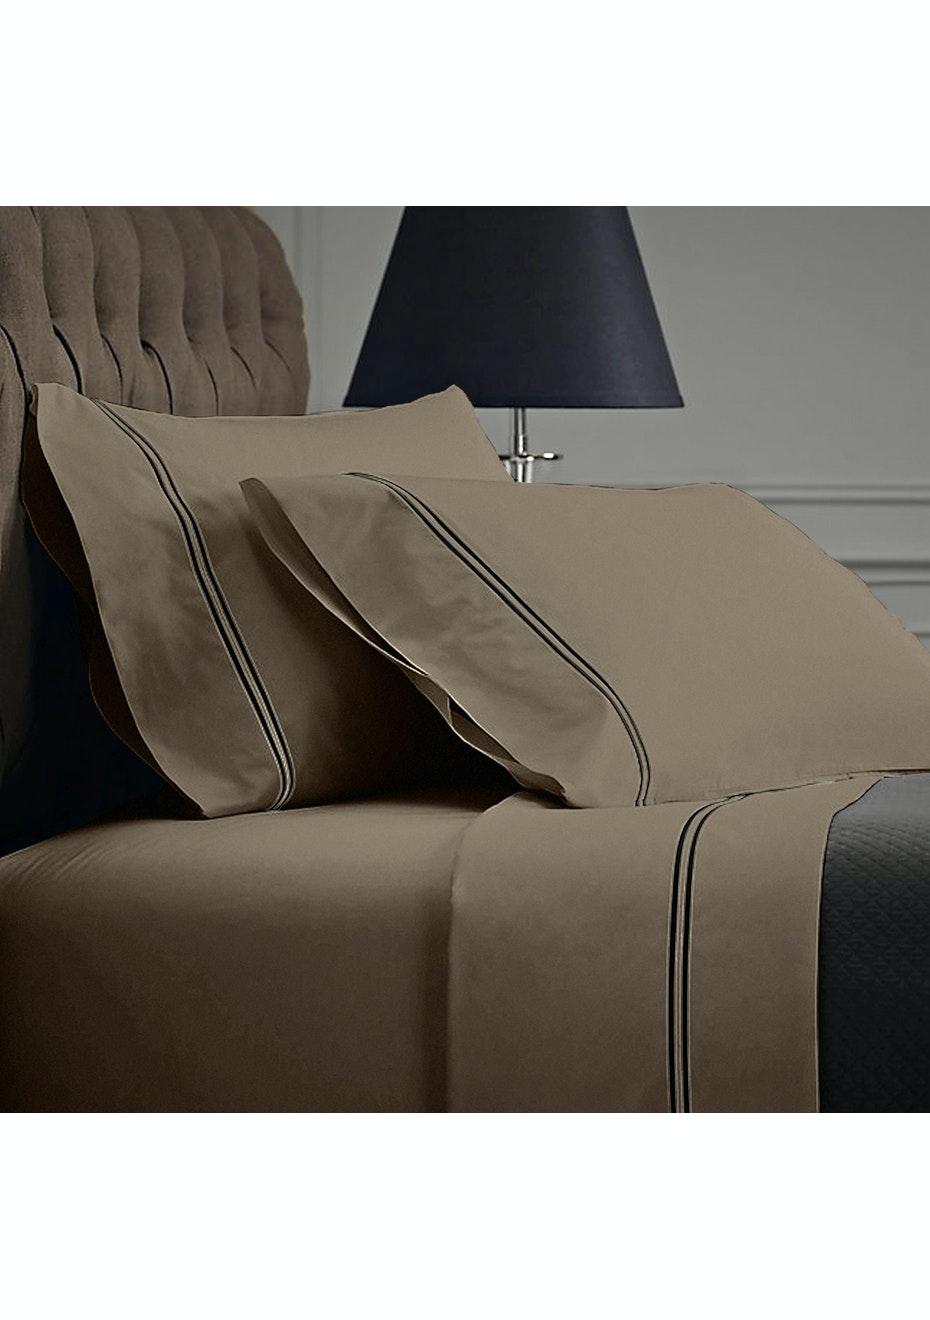 Style & Co 1000 Thread count Egyptian Cotton Hotel Collection Sorrento Sheet sets Mega King Linen